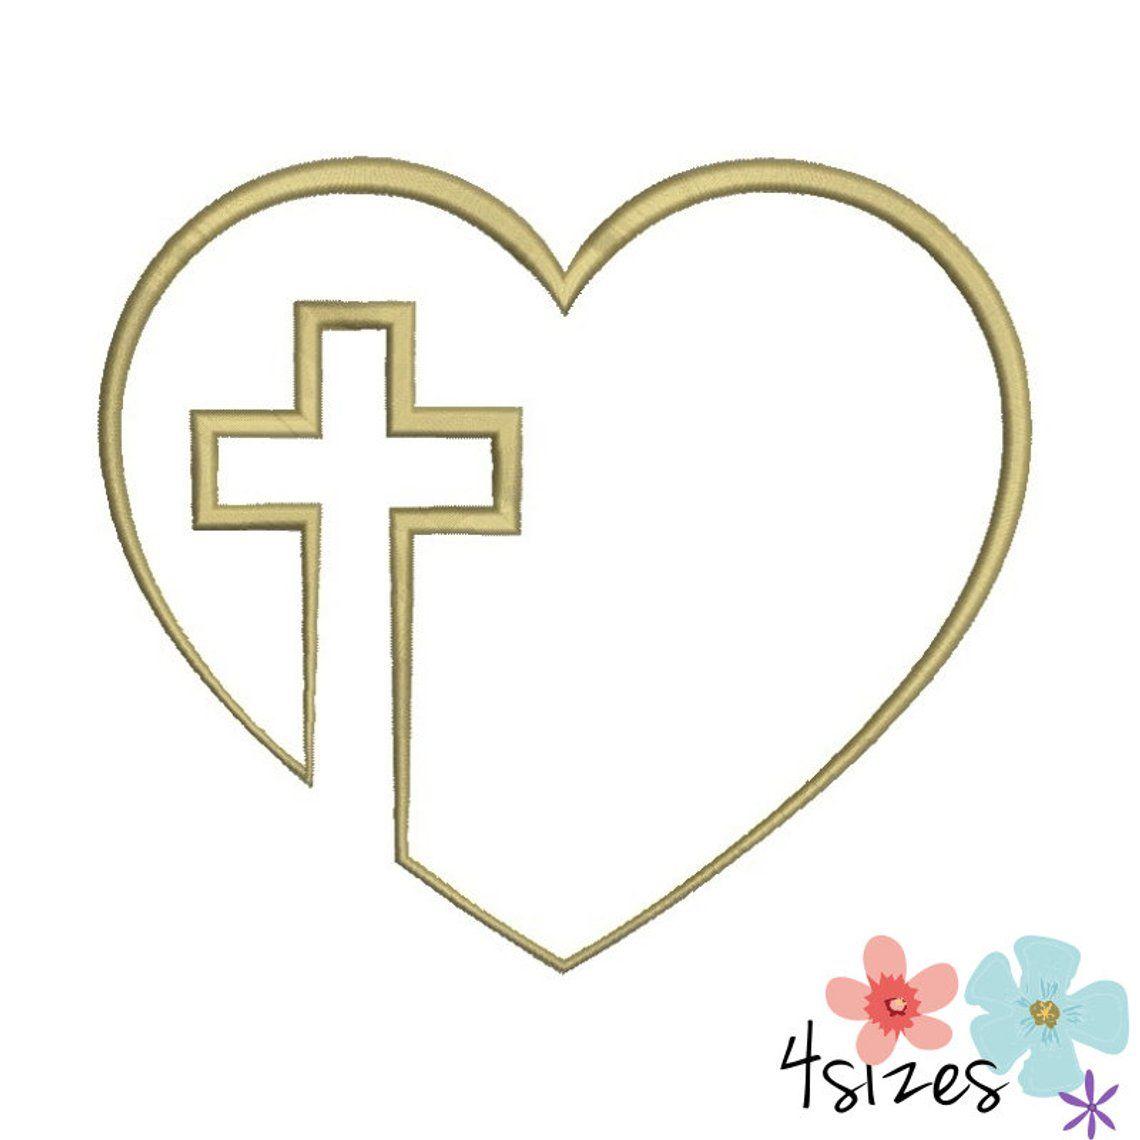 Machine Embroidery Design Christian Cross Heart Designs